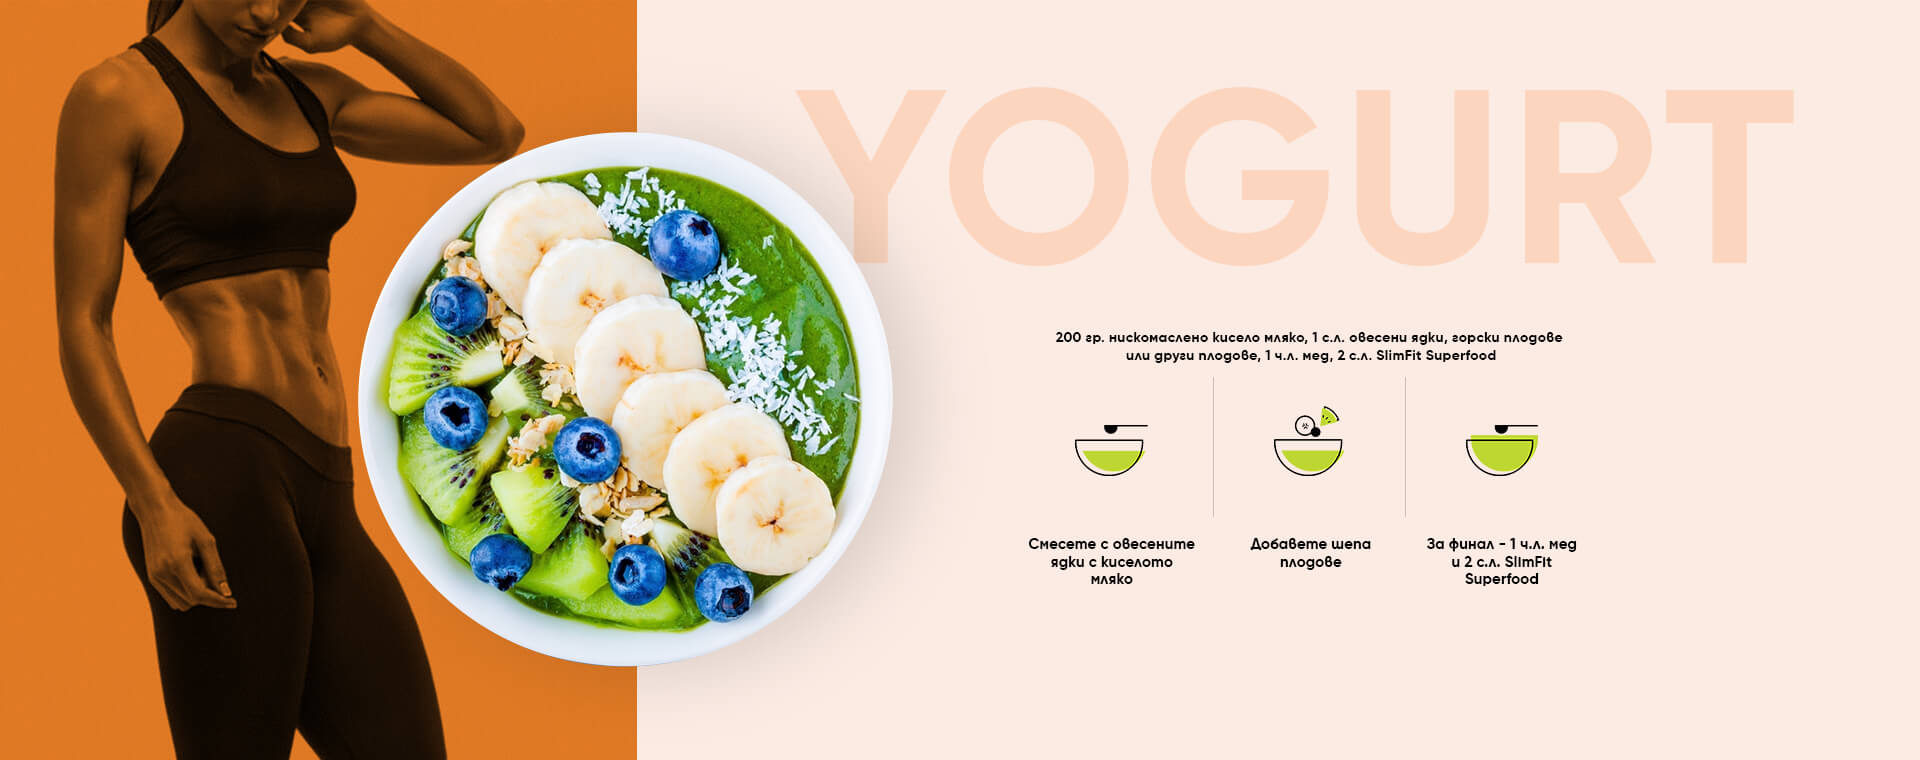 recepies-yogurt-desktop-bg